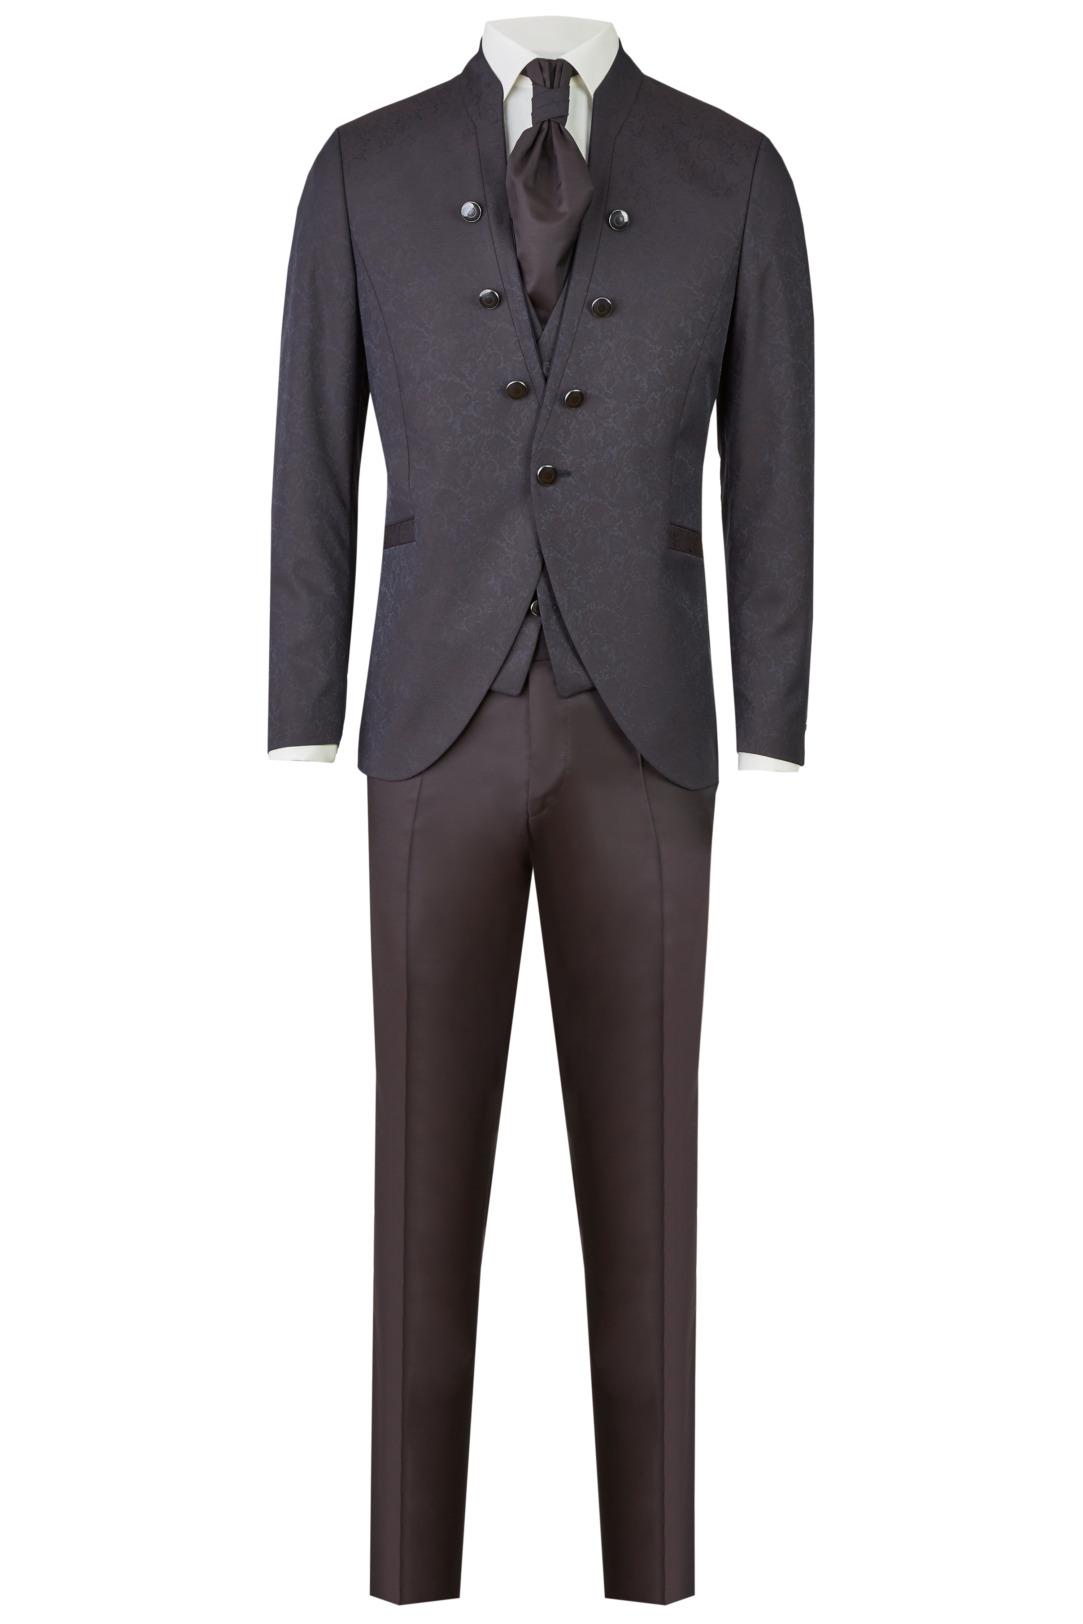 Wilvorst After Six Hochzeitsanzug Männer Mode Bräutigam klassische Form rot braun wil_0121_otf_as-look-5_1